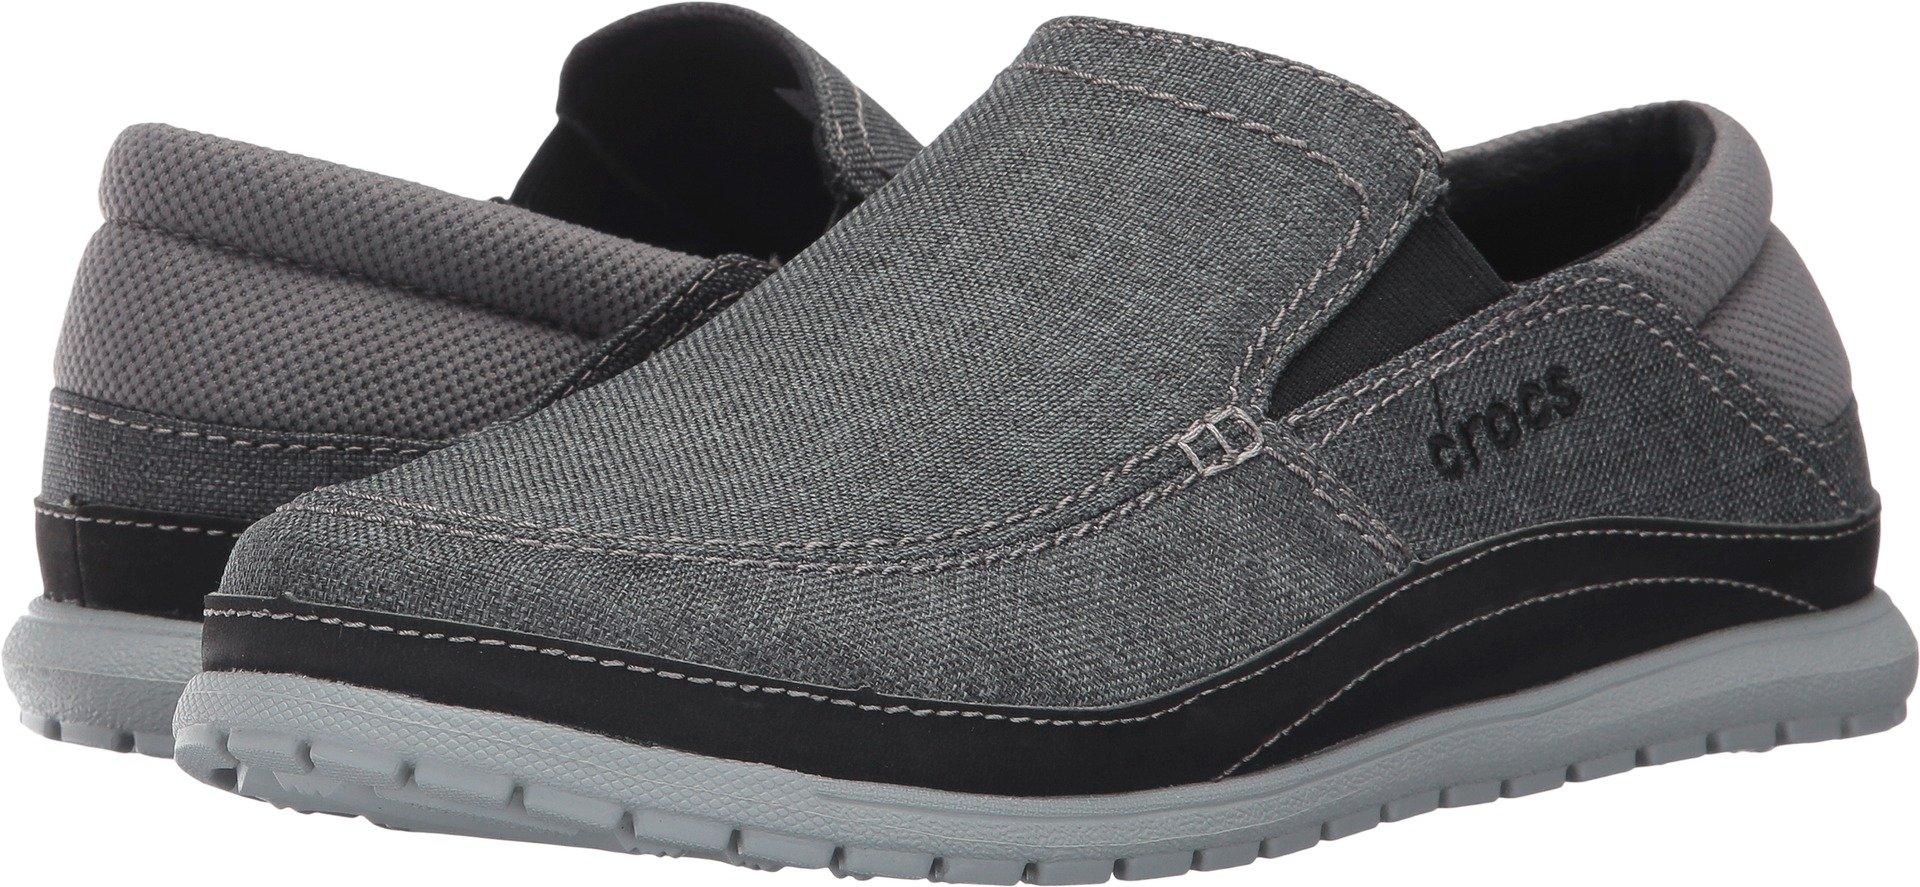 Crocs Men's Santa Cruz Playa Slip-on Loafer,Graphite/Light Grey,11 M US